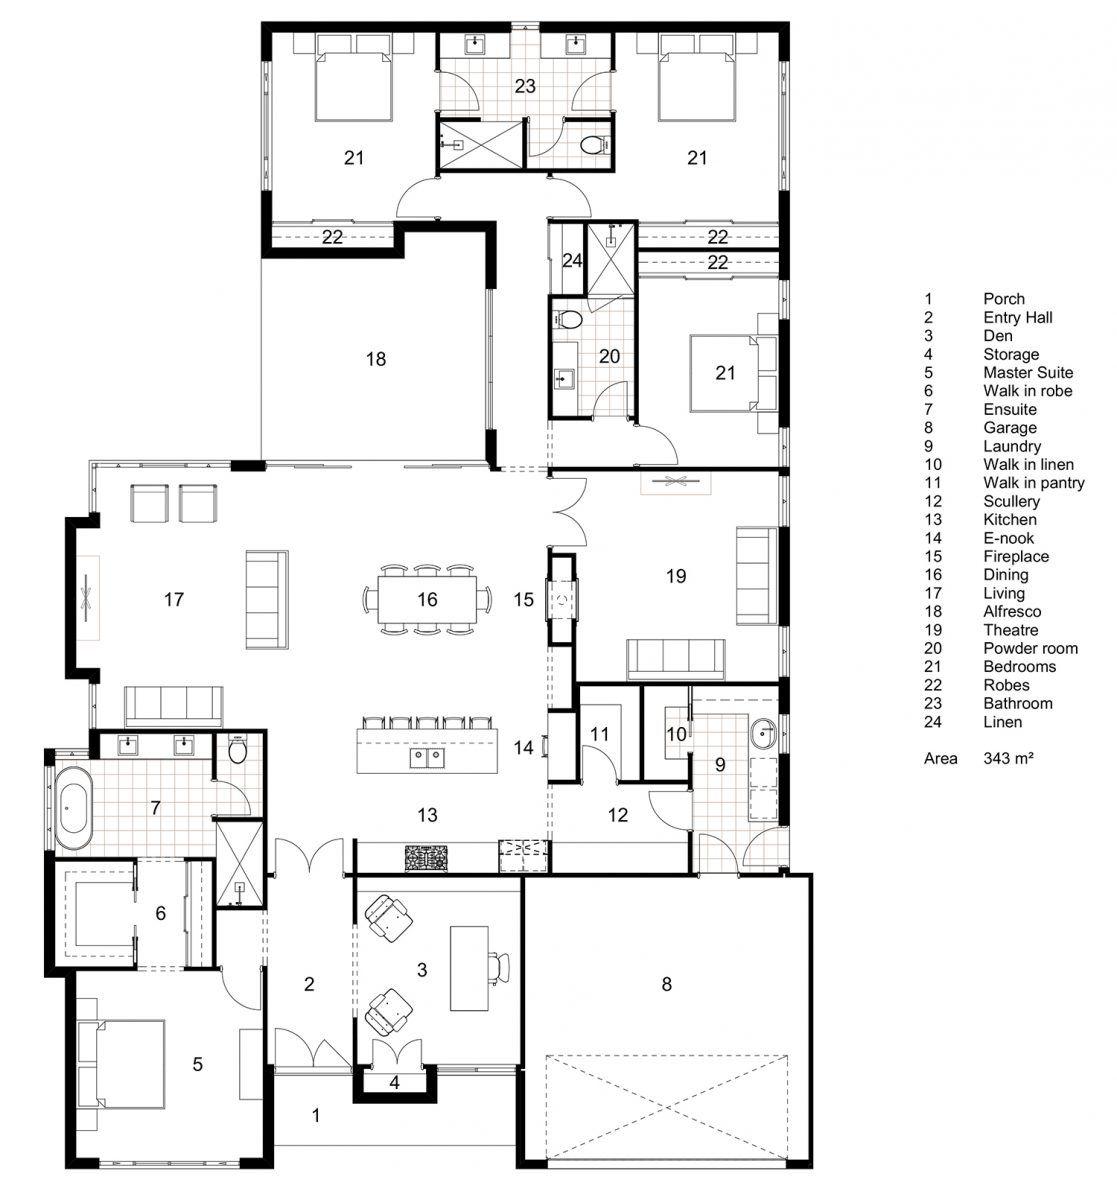 Floor Plan Friday Classic Hamptons Single Storey Home Single Storey House Plans Floor Plans 4 Bedroom House Plans